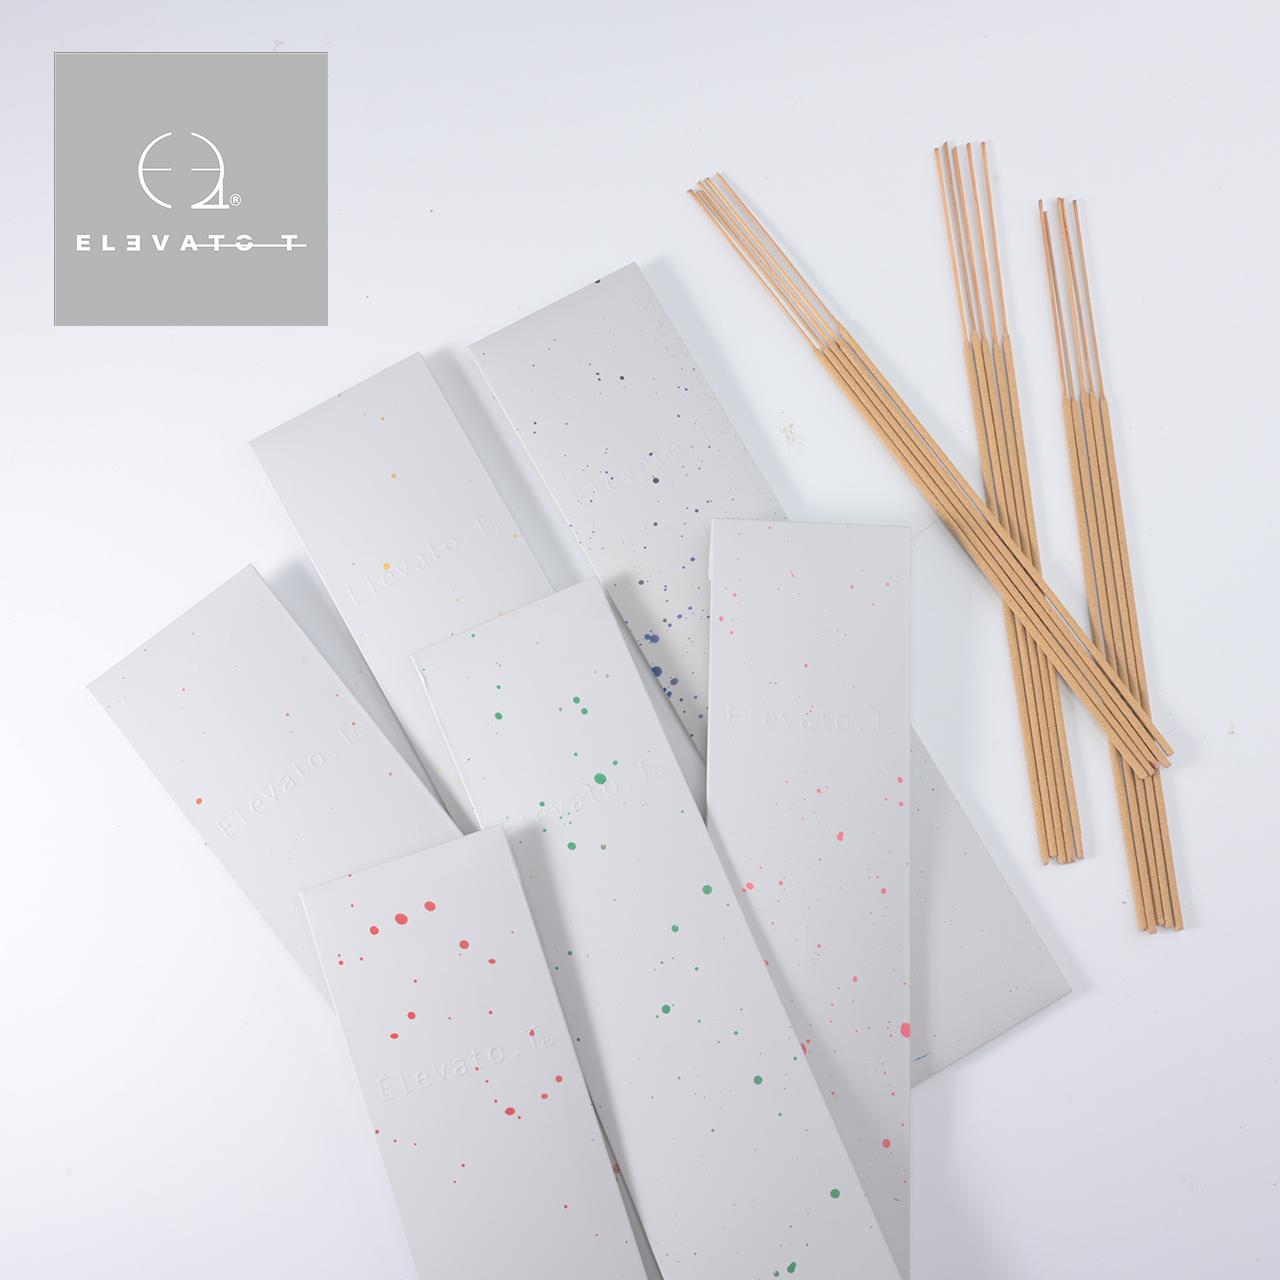 Elevato.t,生活選物,生活雜貨,台灣品牌,台灣香氛品牌,香氛品牌